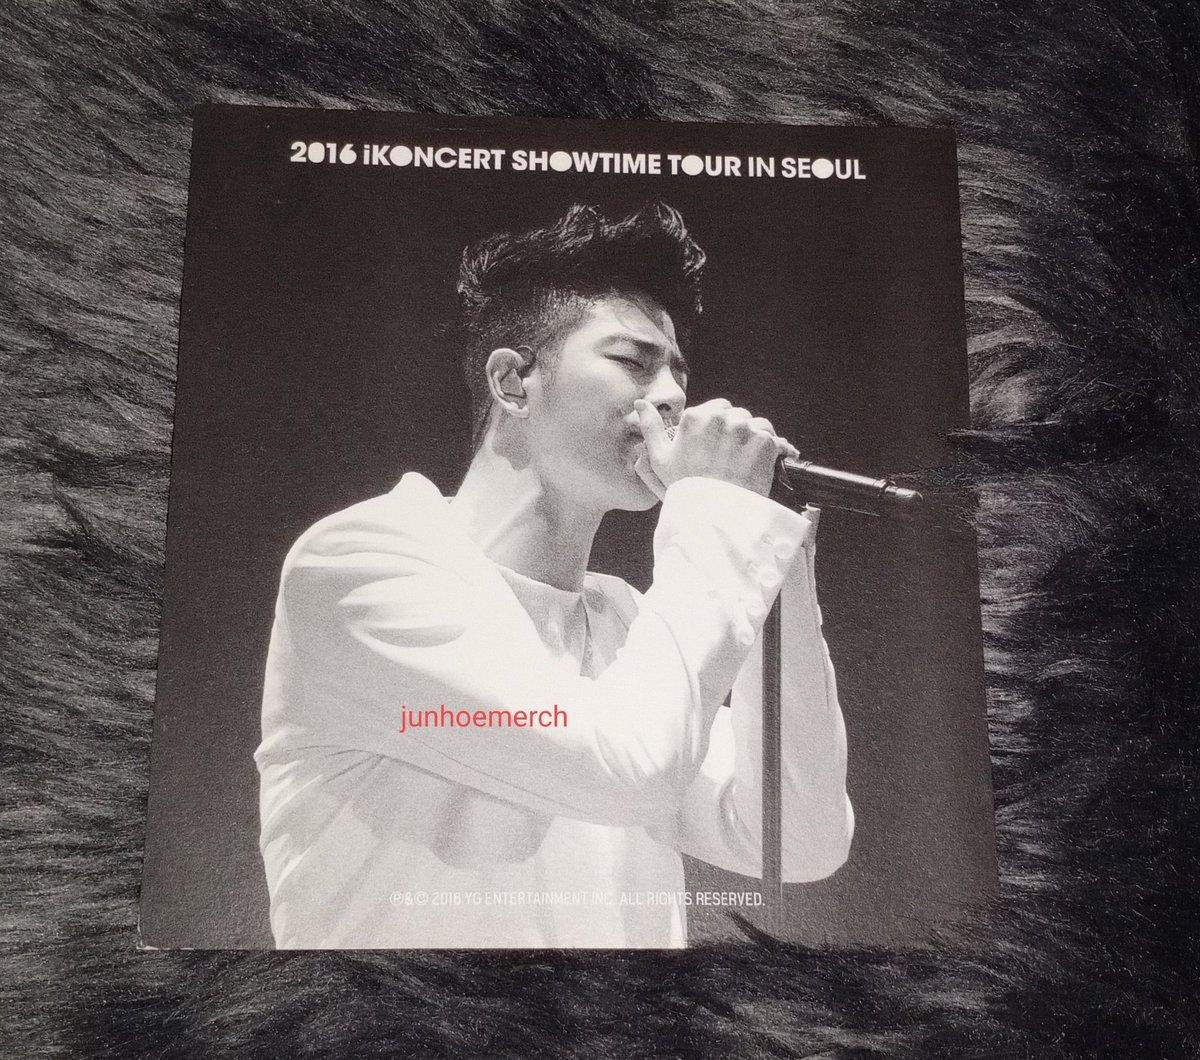 ♡ 2016 iKONCERT Showtime Tour in Seoul Junhoe Postcard ♡  @tkwpcnfak #iKON #JUNE #Junhoe